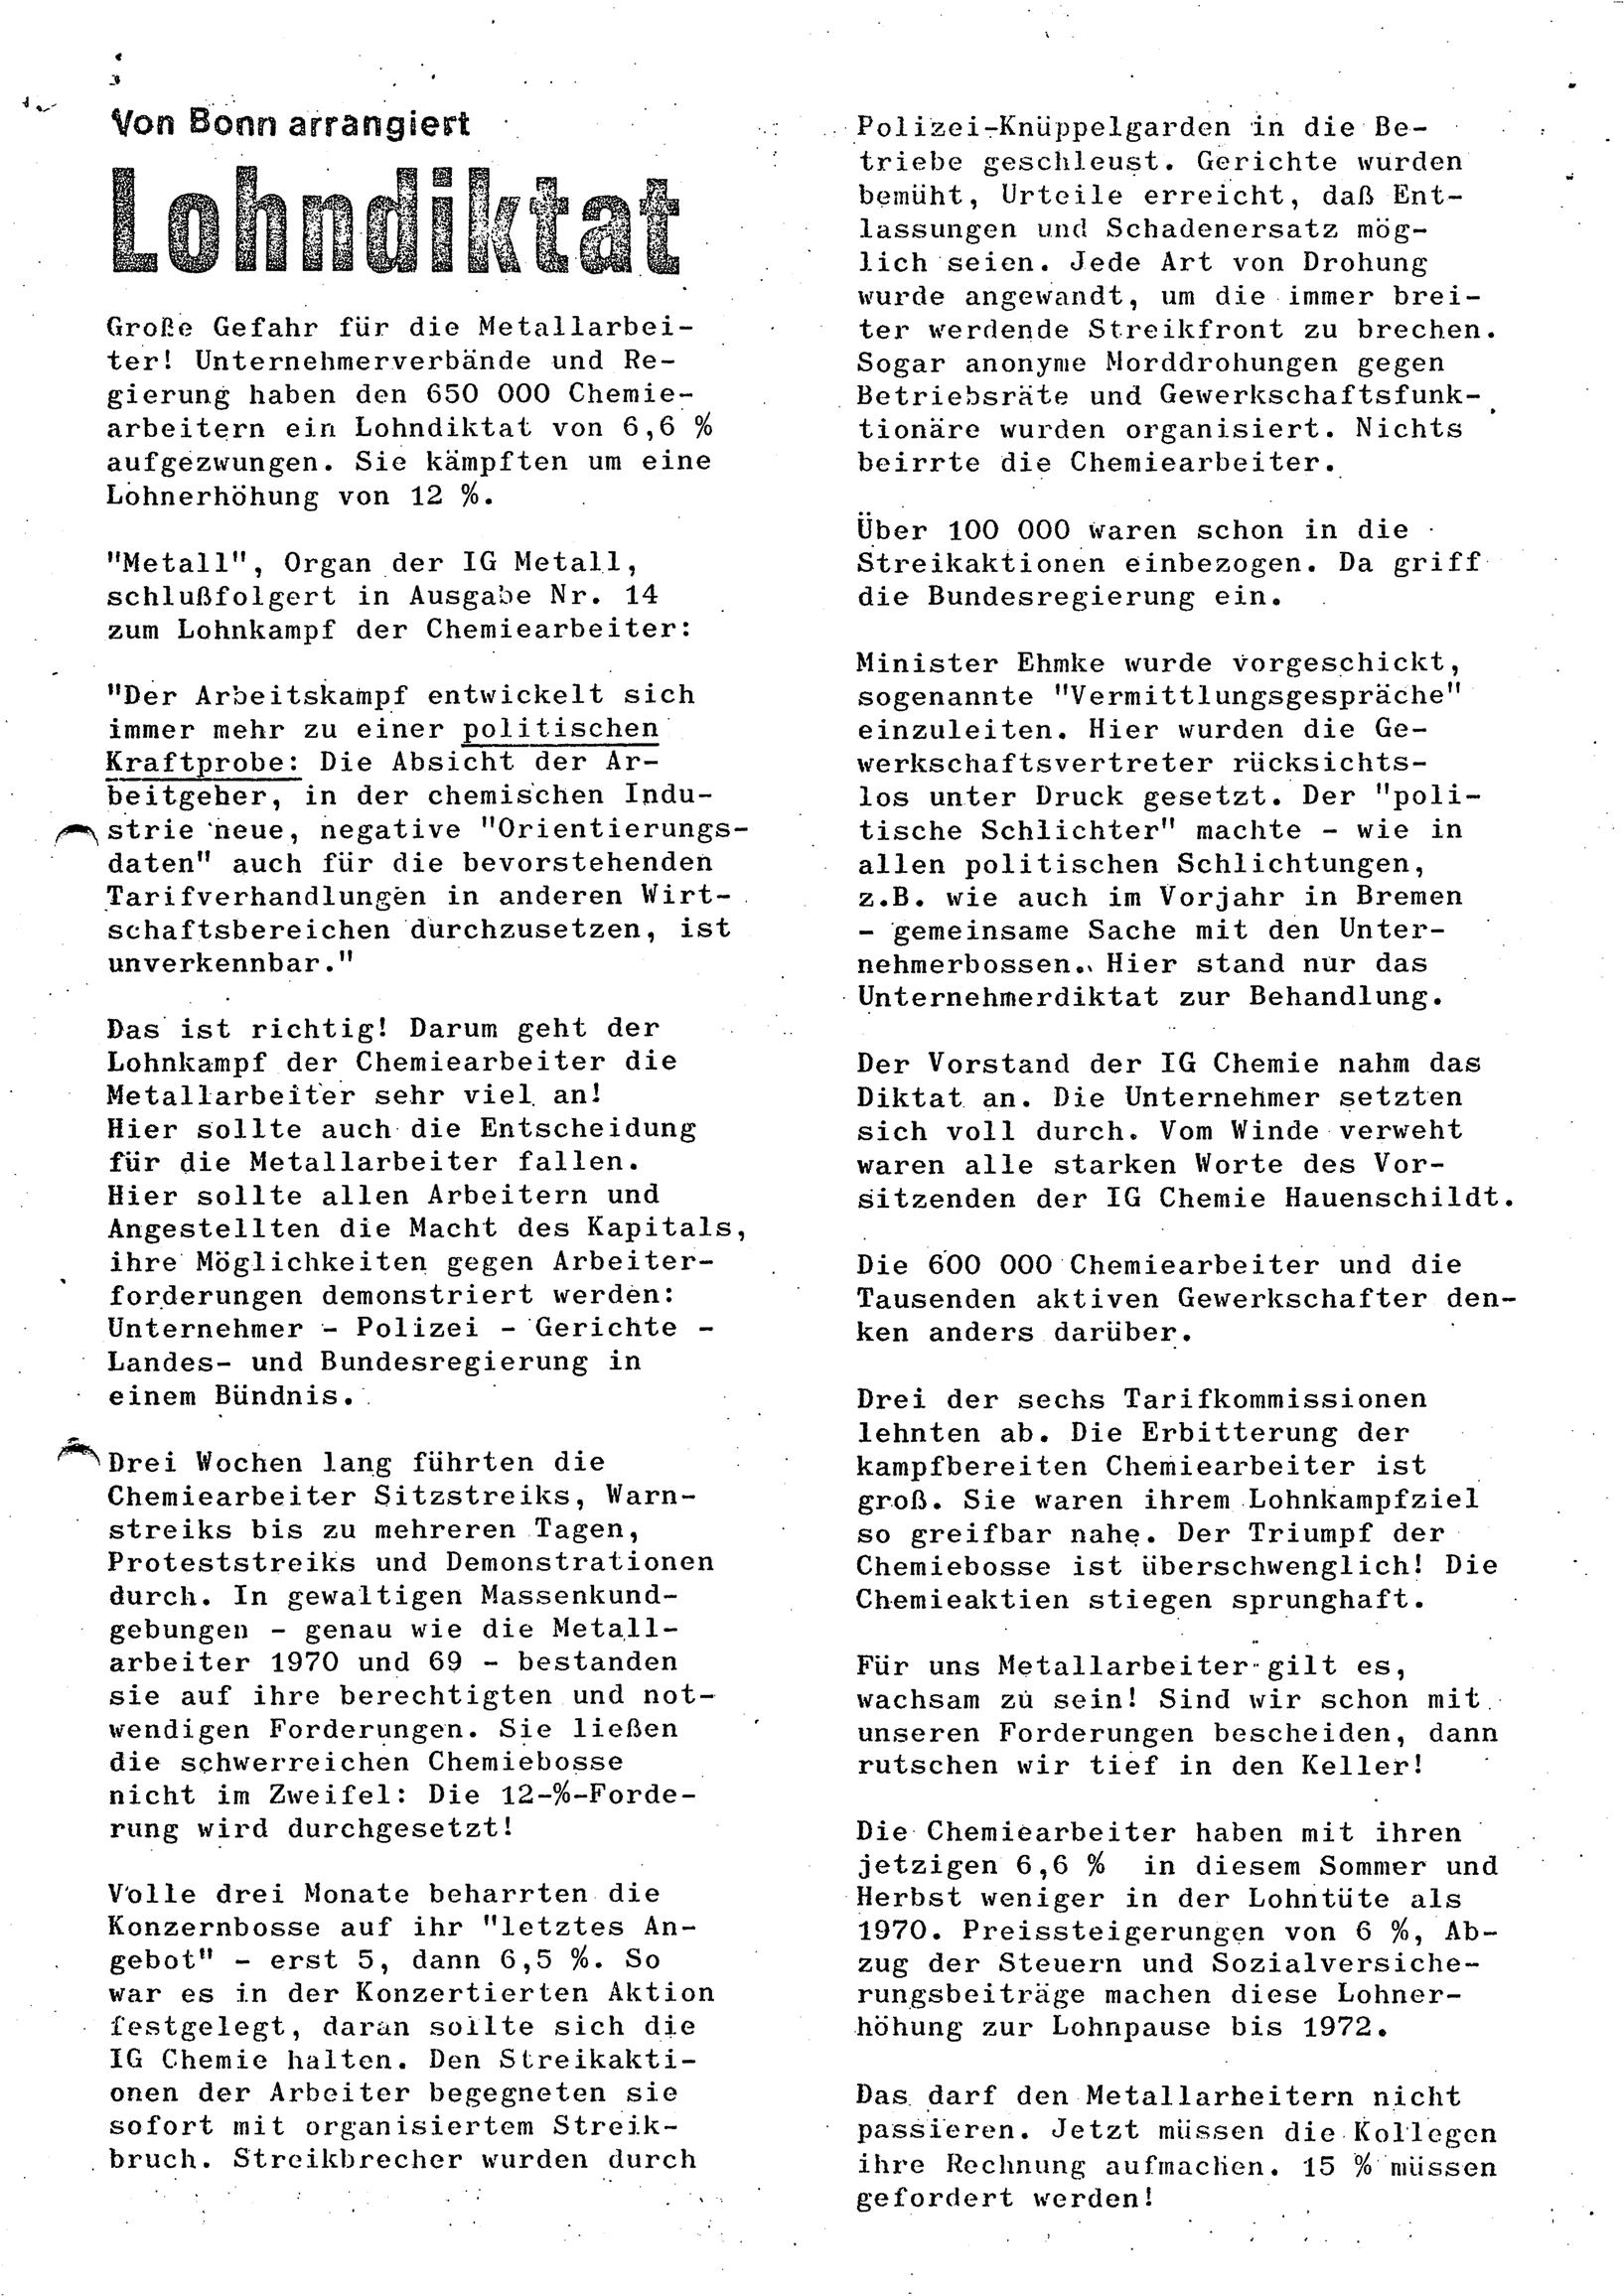 Bremen_Kloeckner224